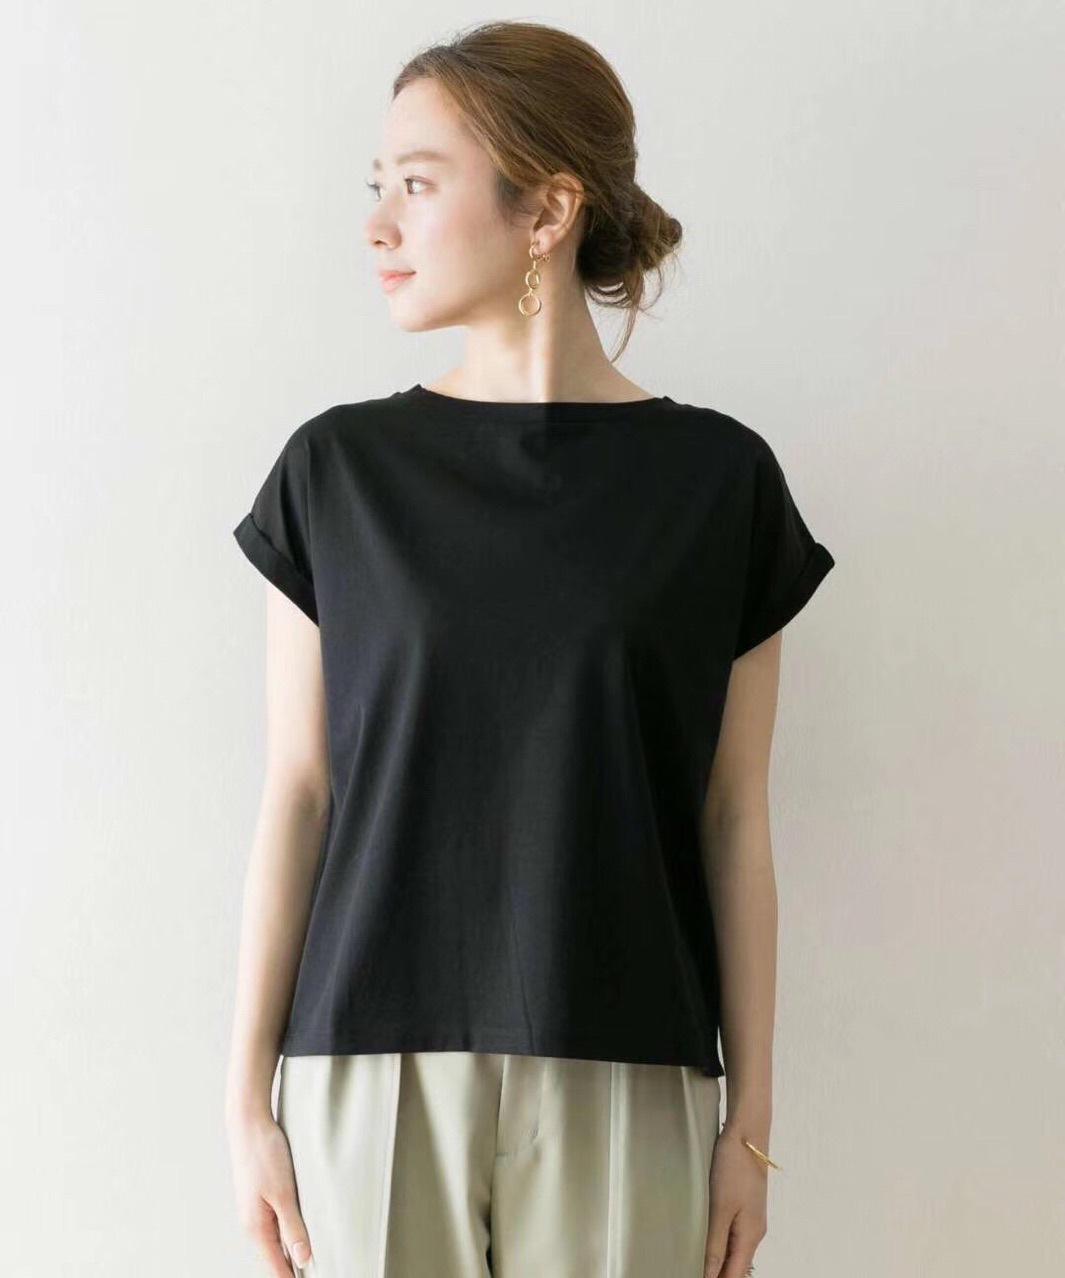 UR原 新款短袖T恤上衣 日本剛剛出貨 官網預約款 簡約大百搭純棉